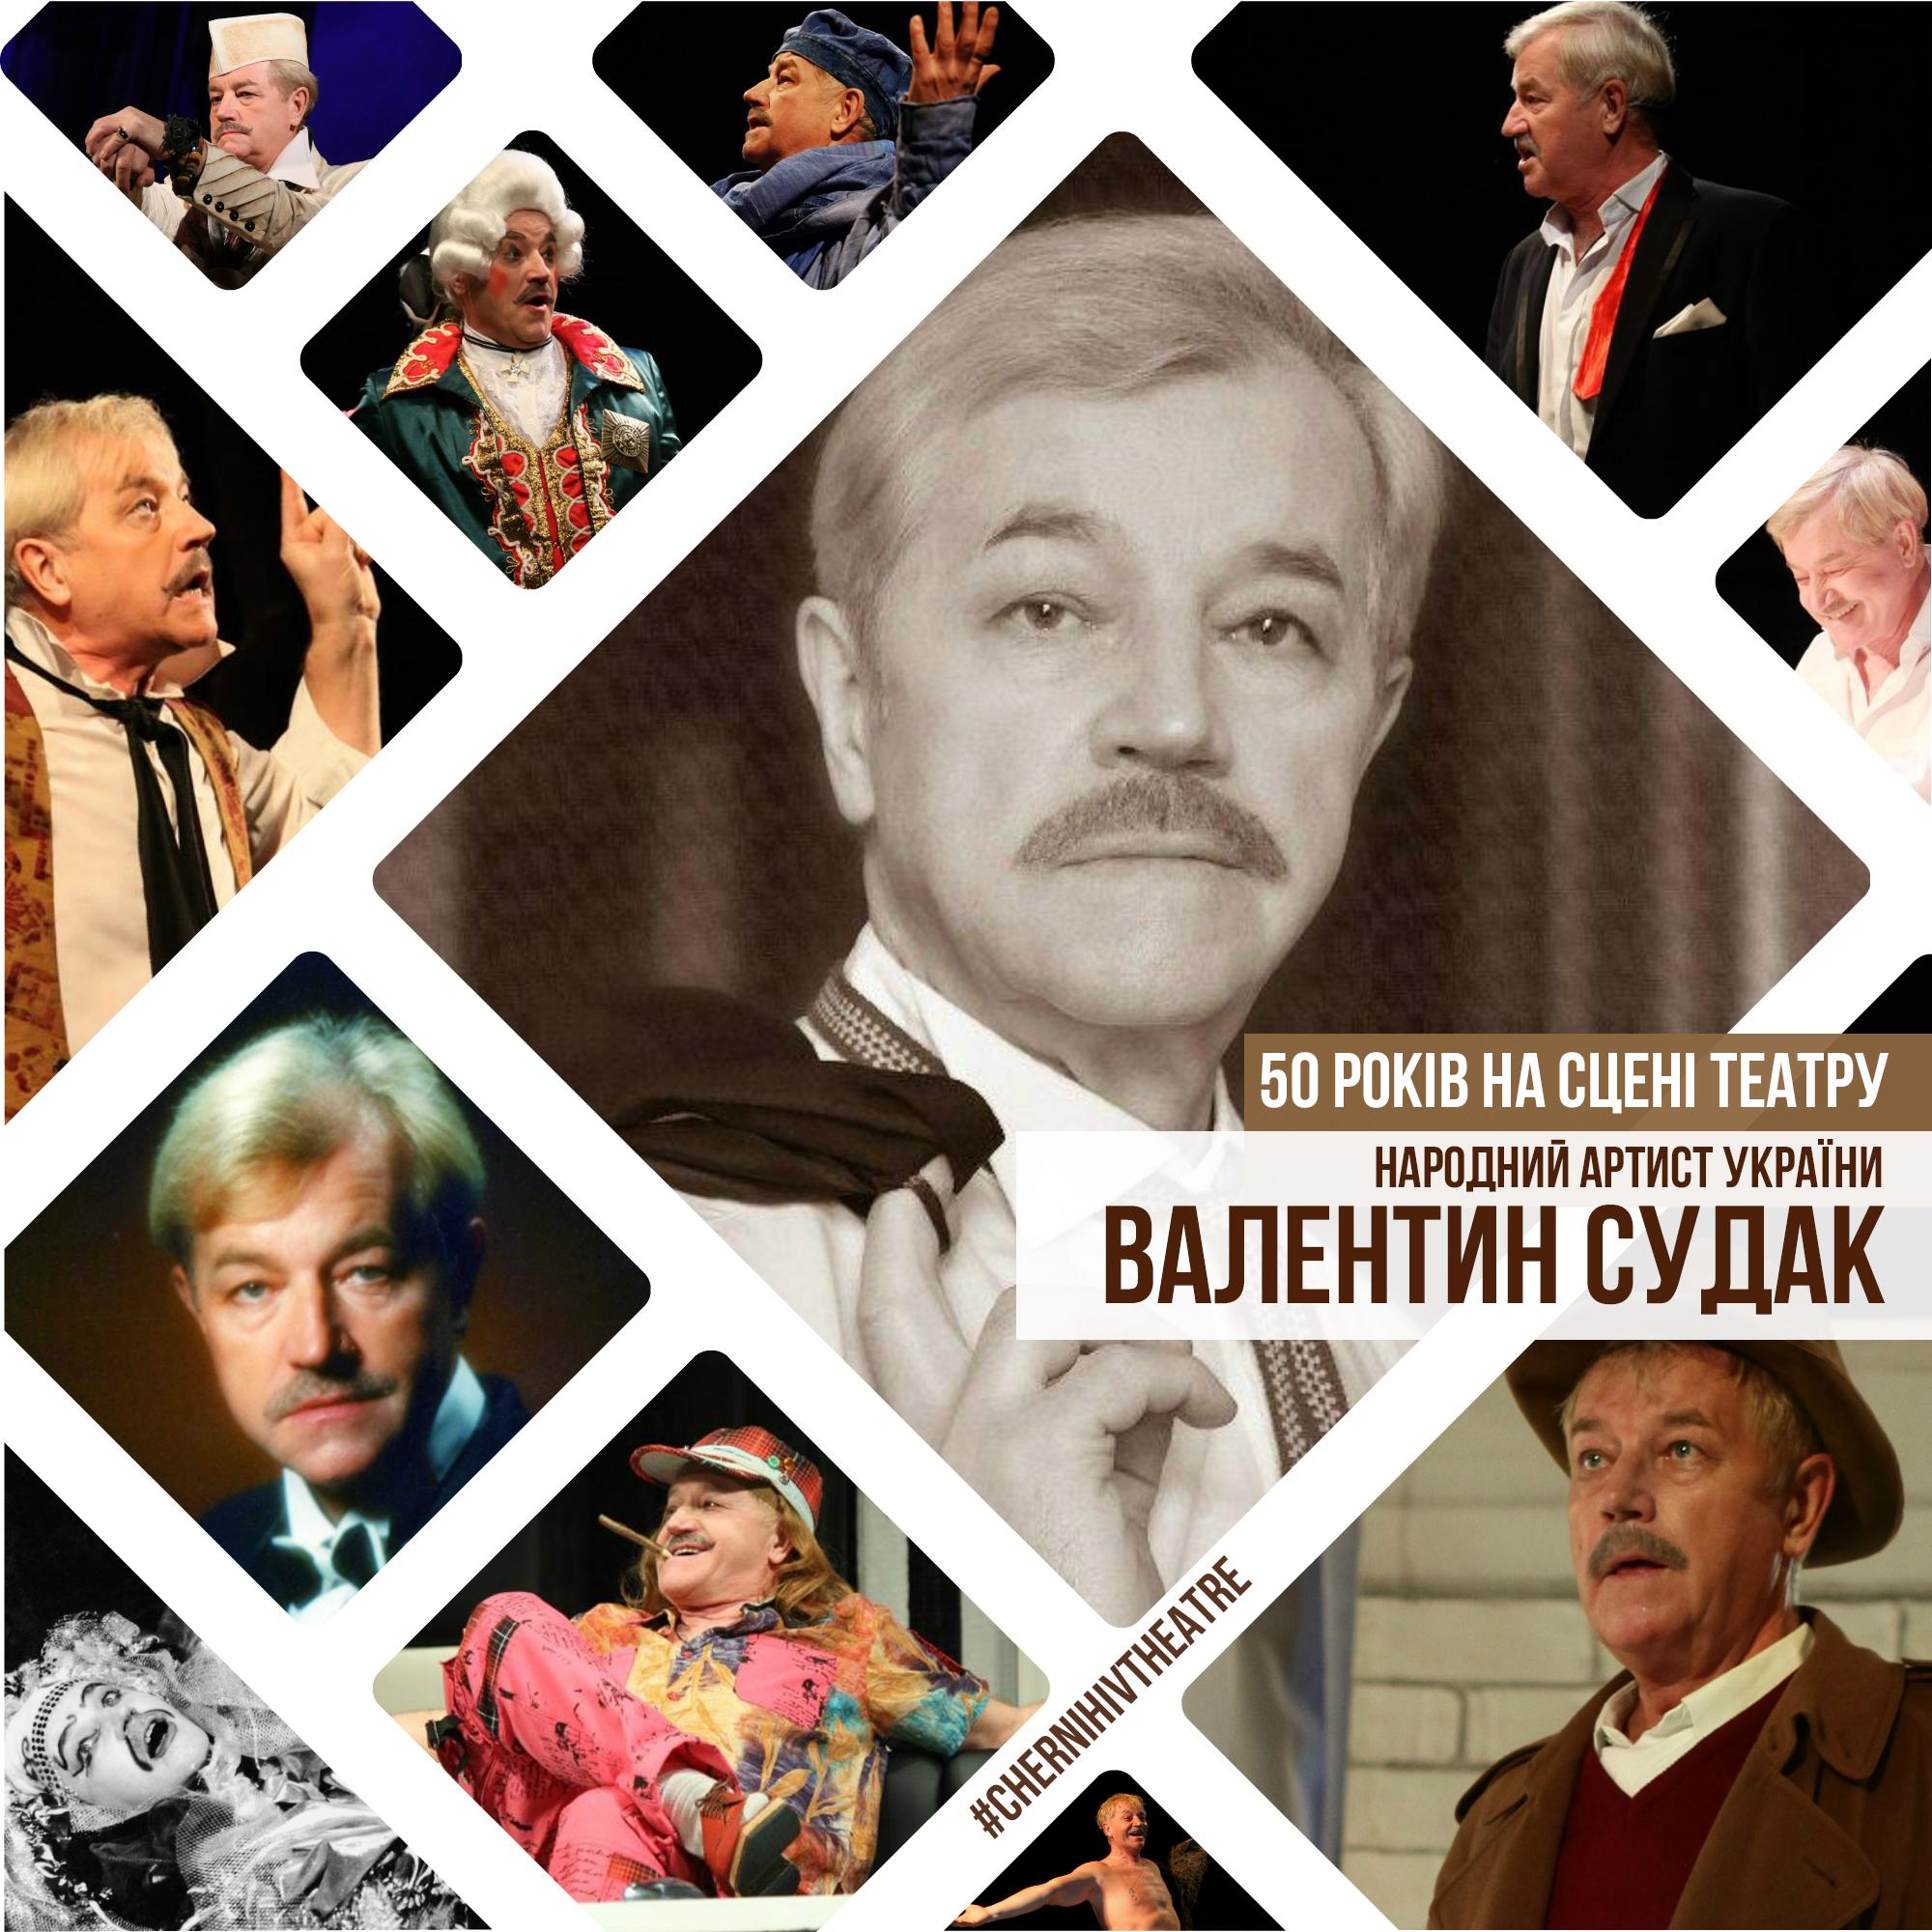 Валентин Судак